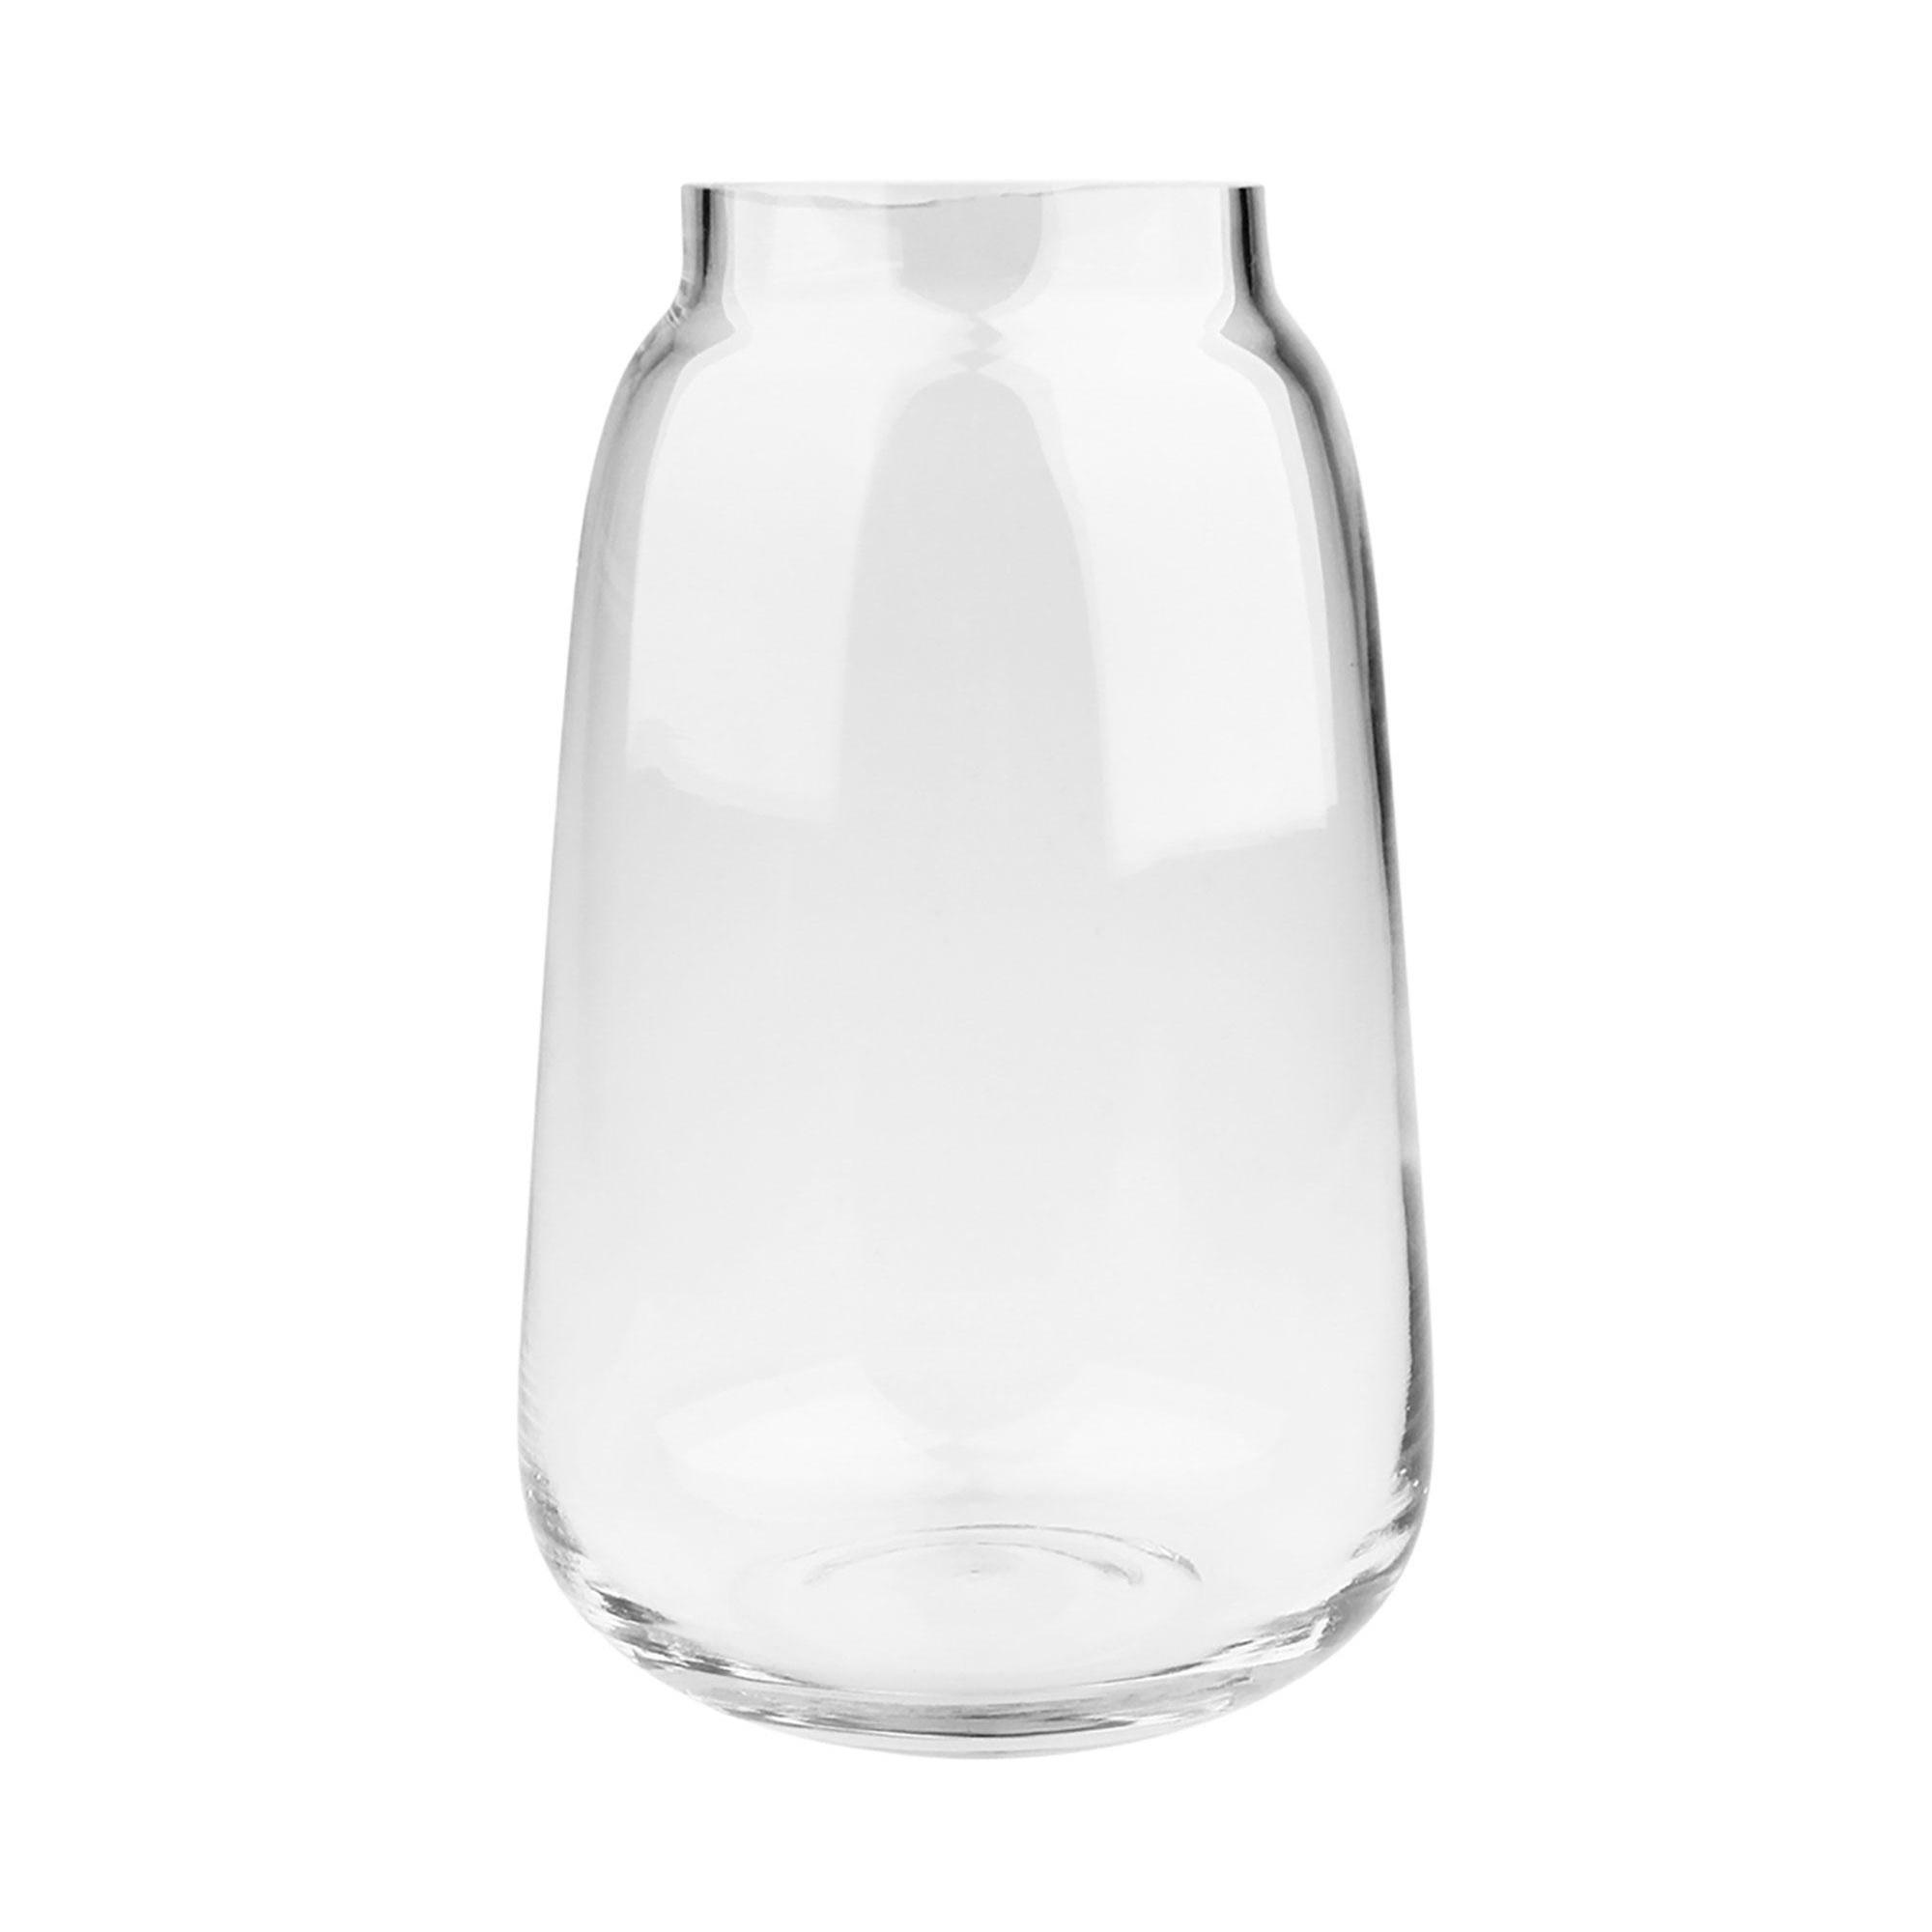 Collection - Bou Vase H 24cm - transparent/H x Ø 24x15cm günstig online kaufen